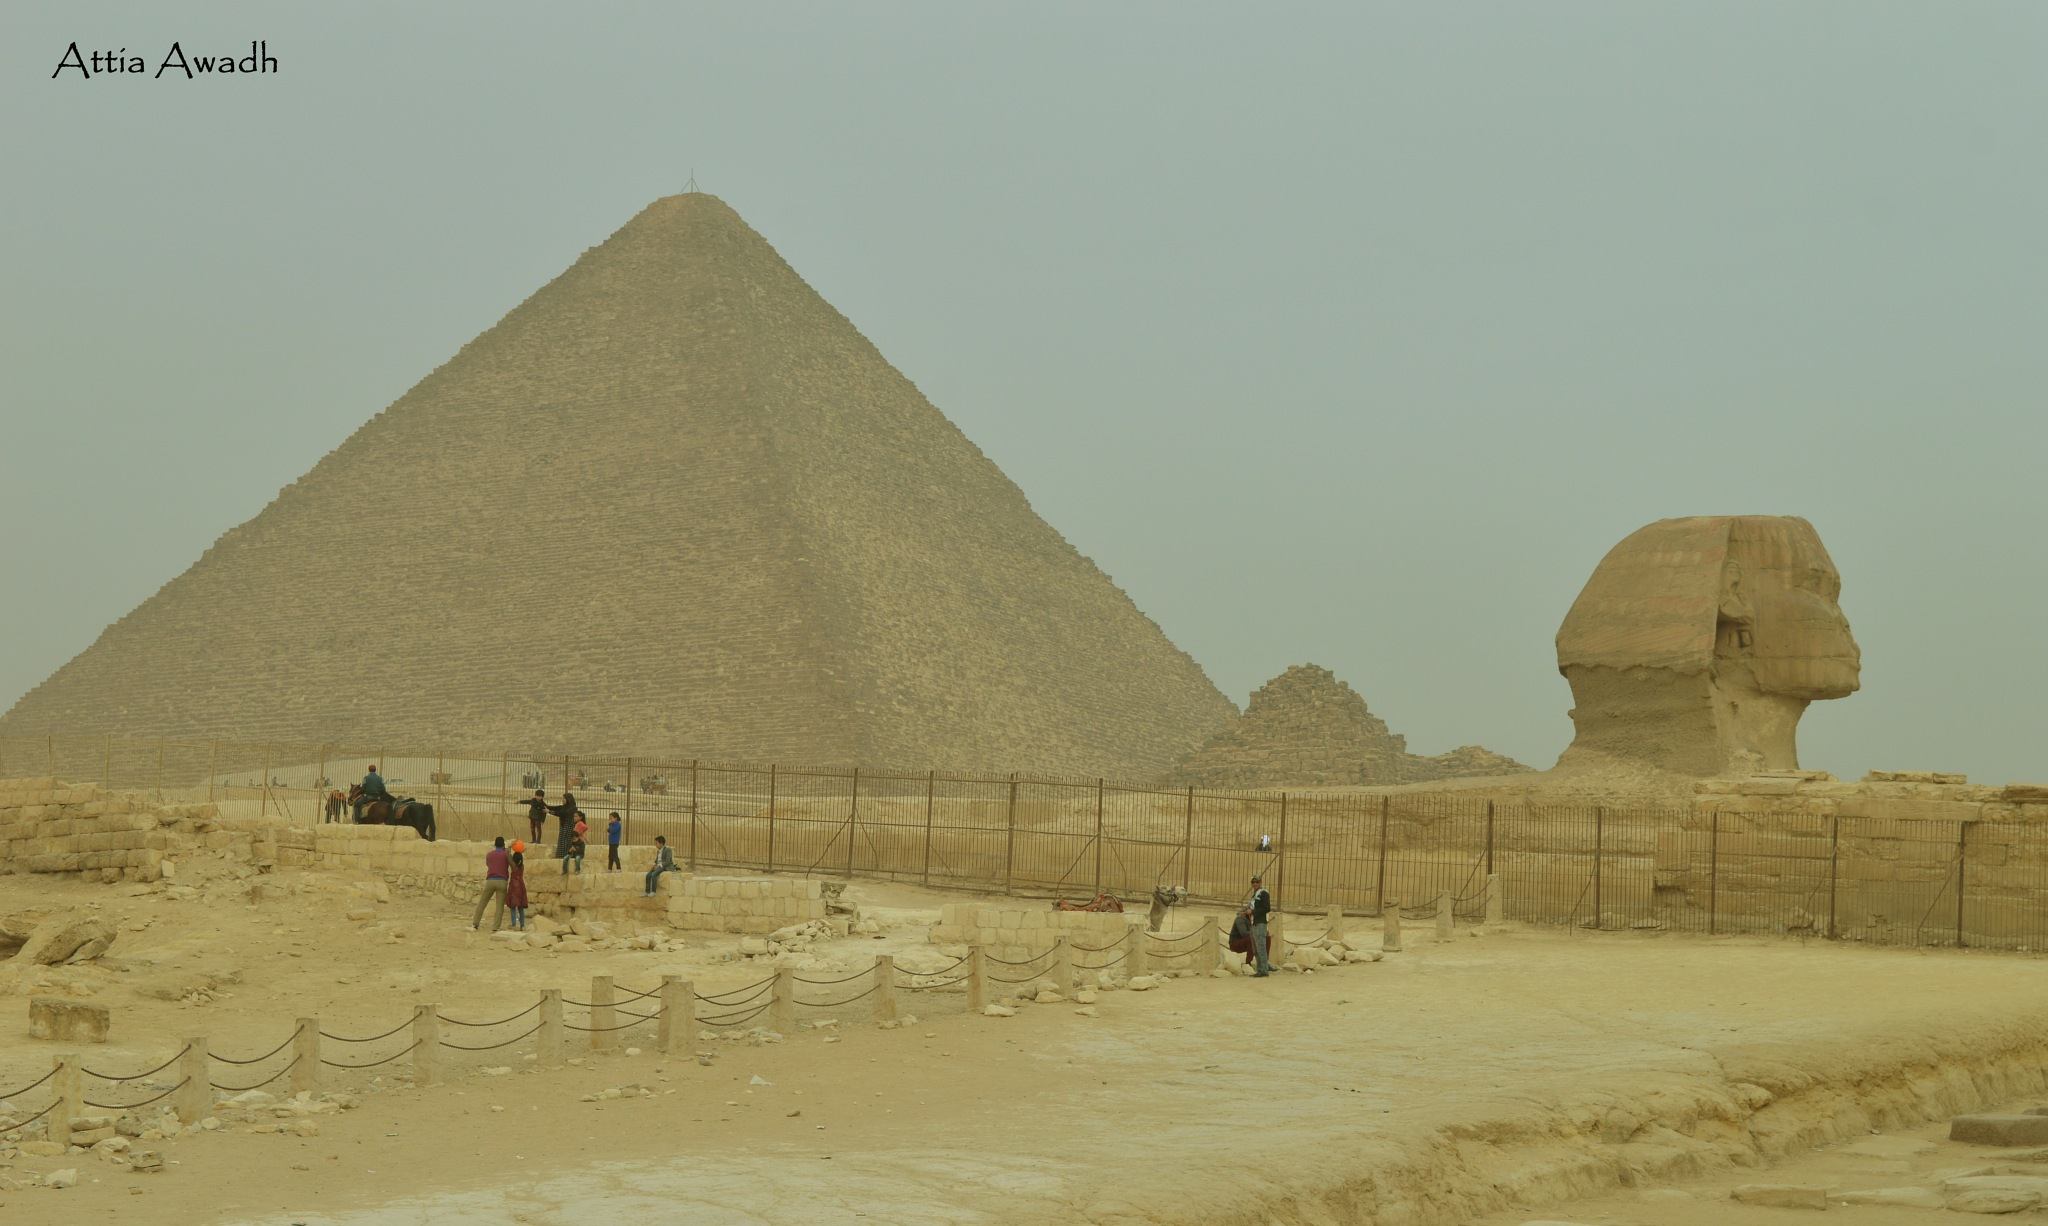 Sphinx and Pyramids by Attia Awadh